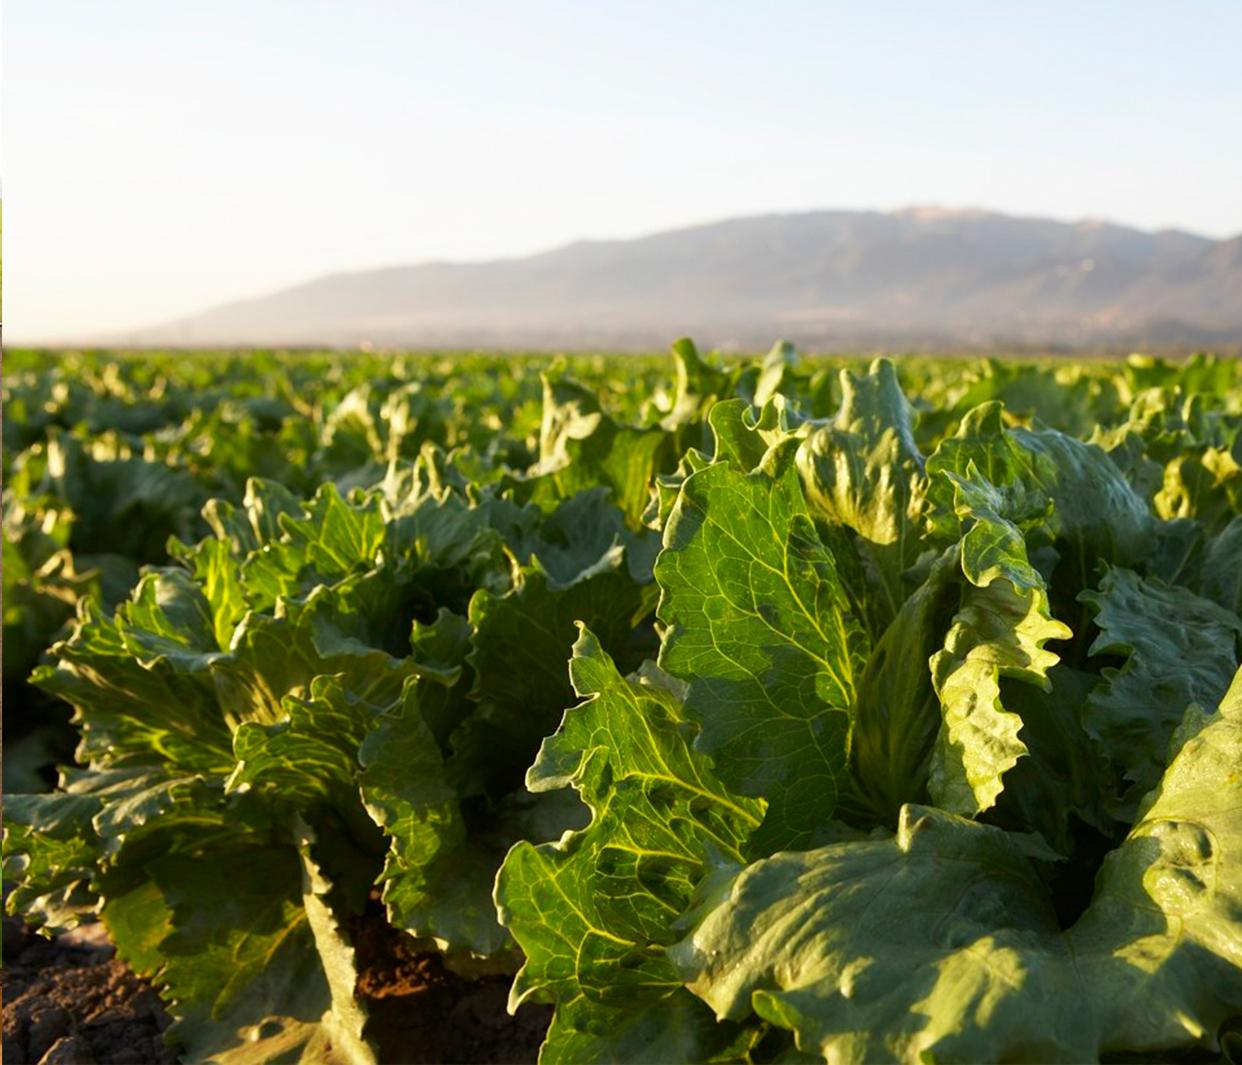 photo of an iceberg lettuce field